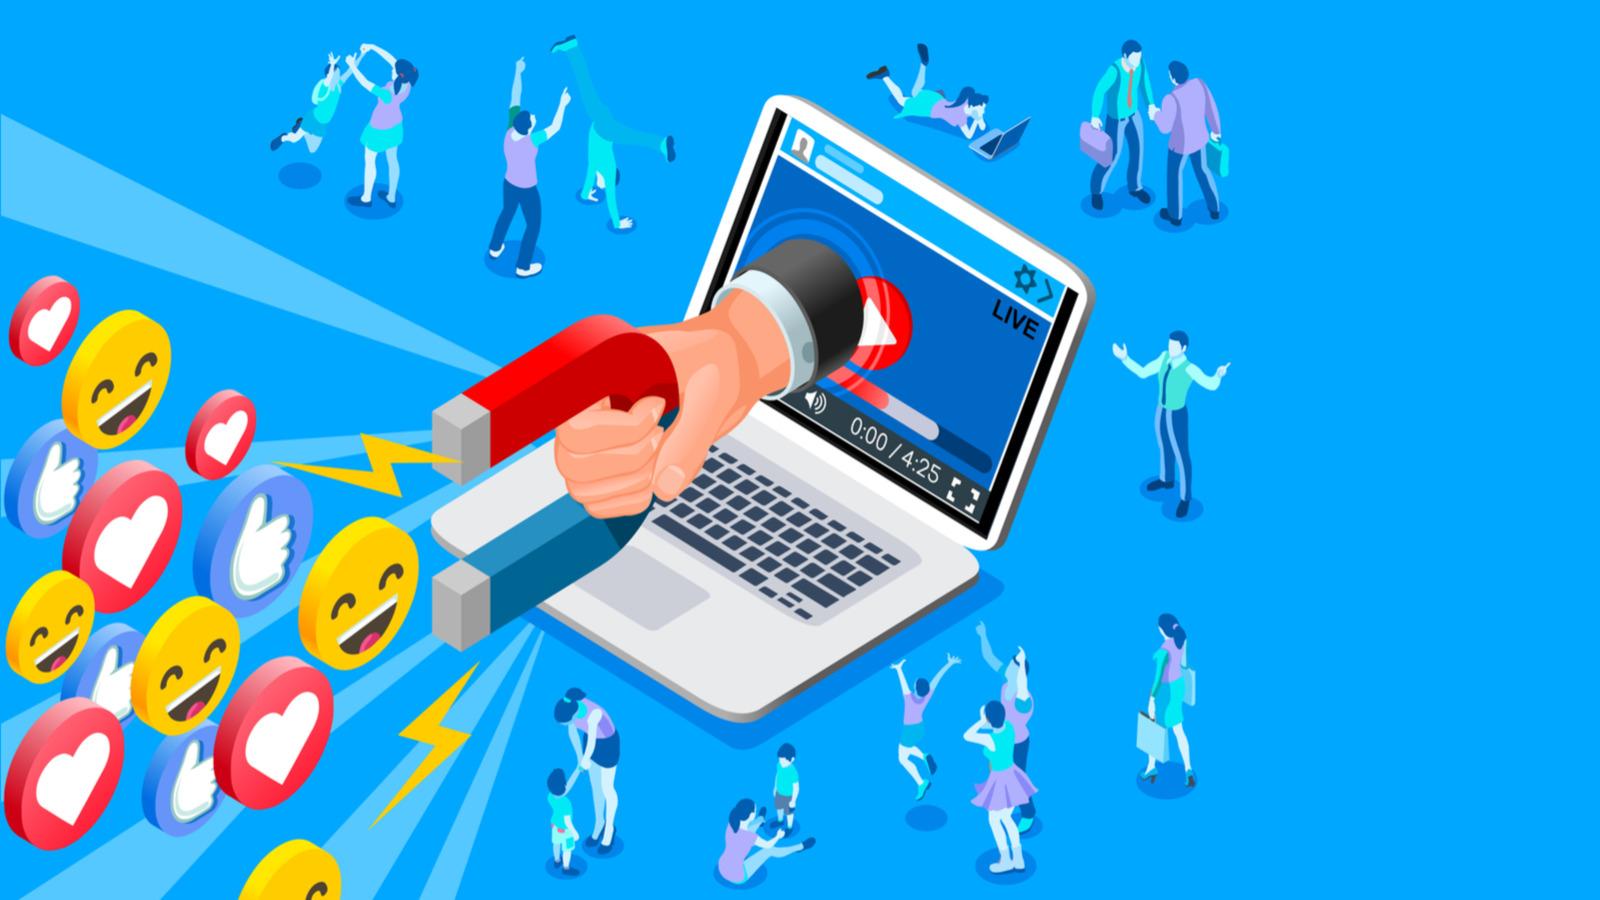 Social media marketing ideas for Shopify brands